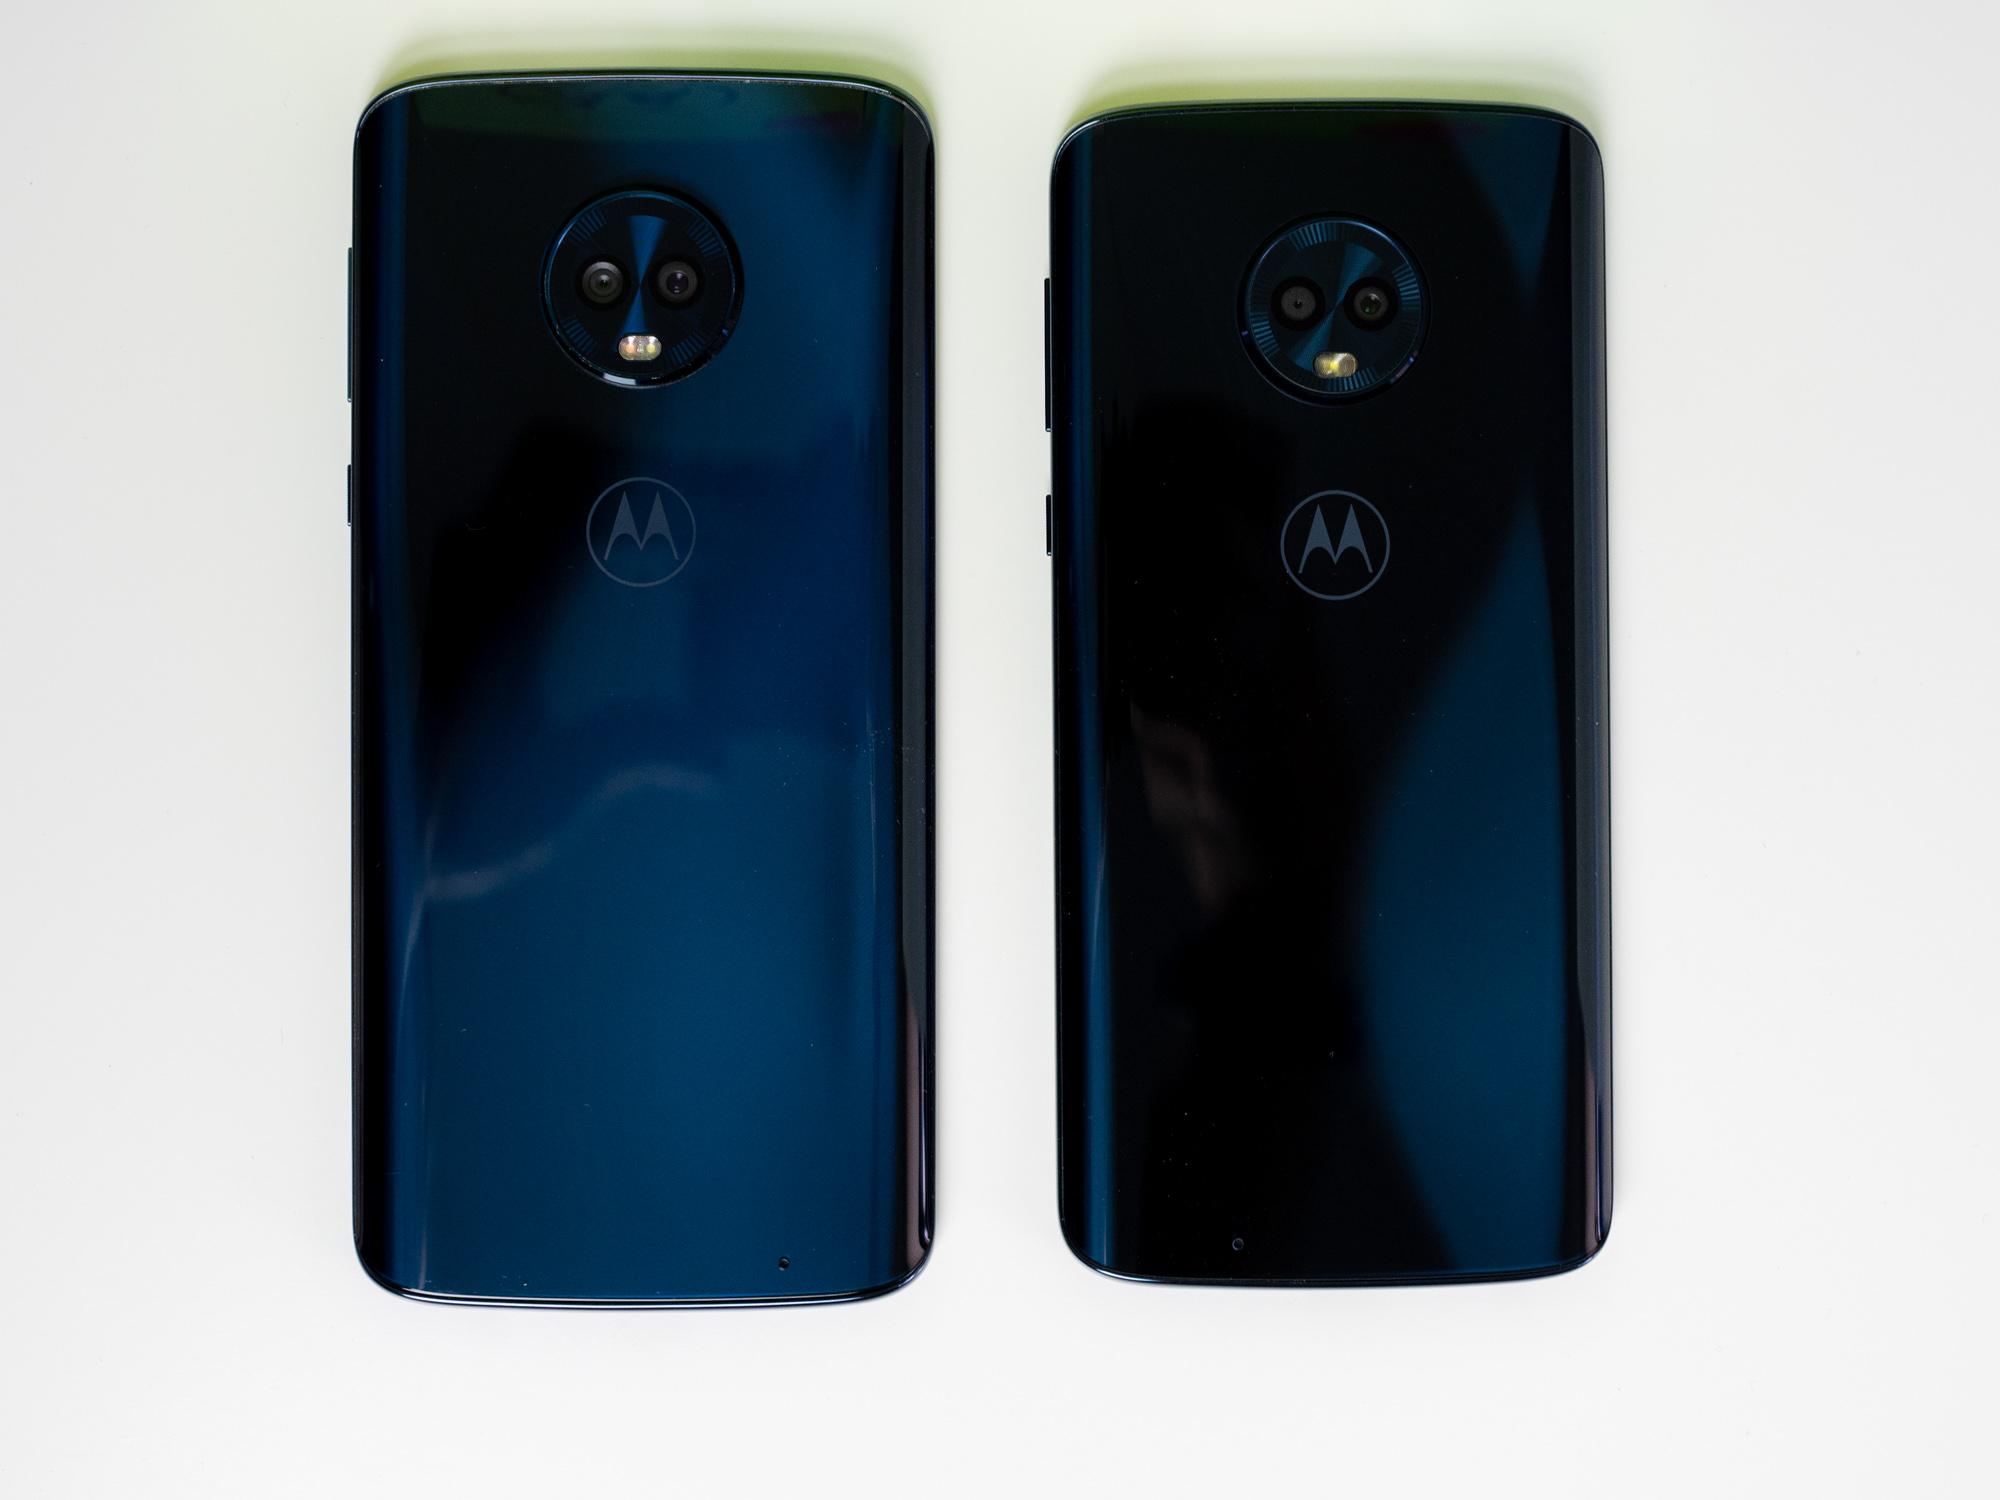 Motorola Moto G6 Plus kontra Moto G6